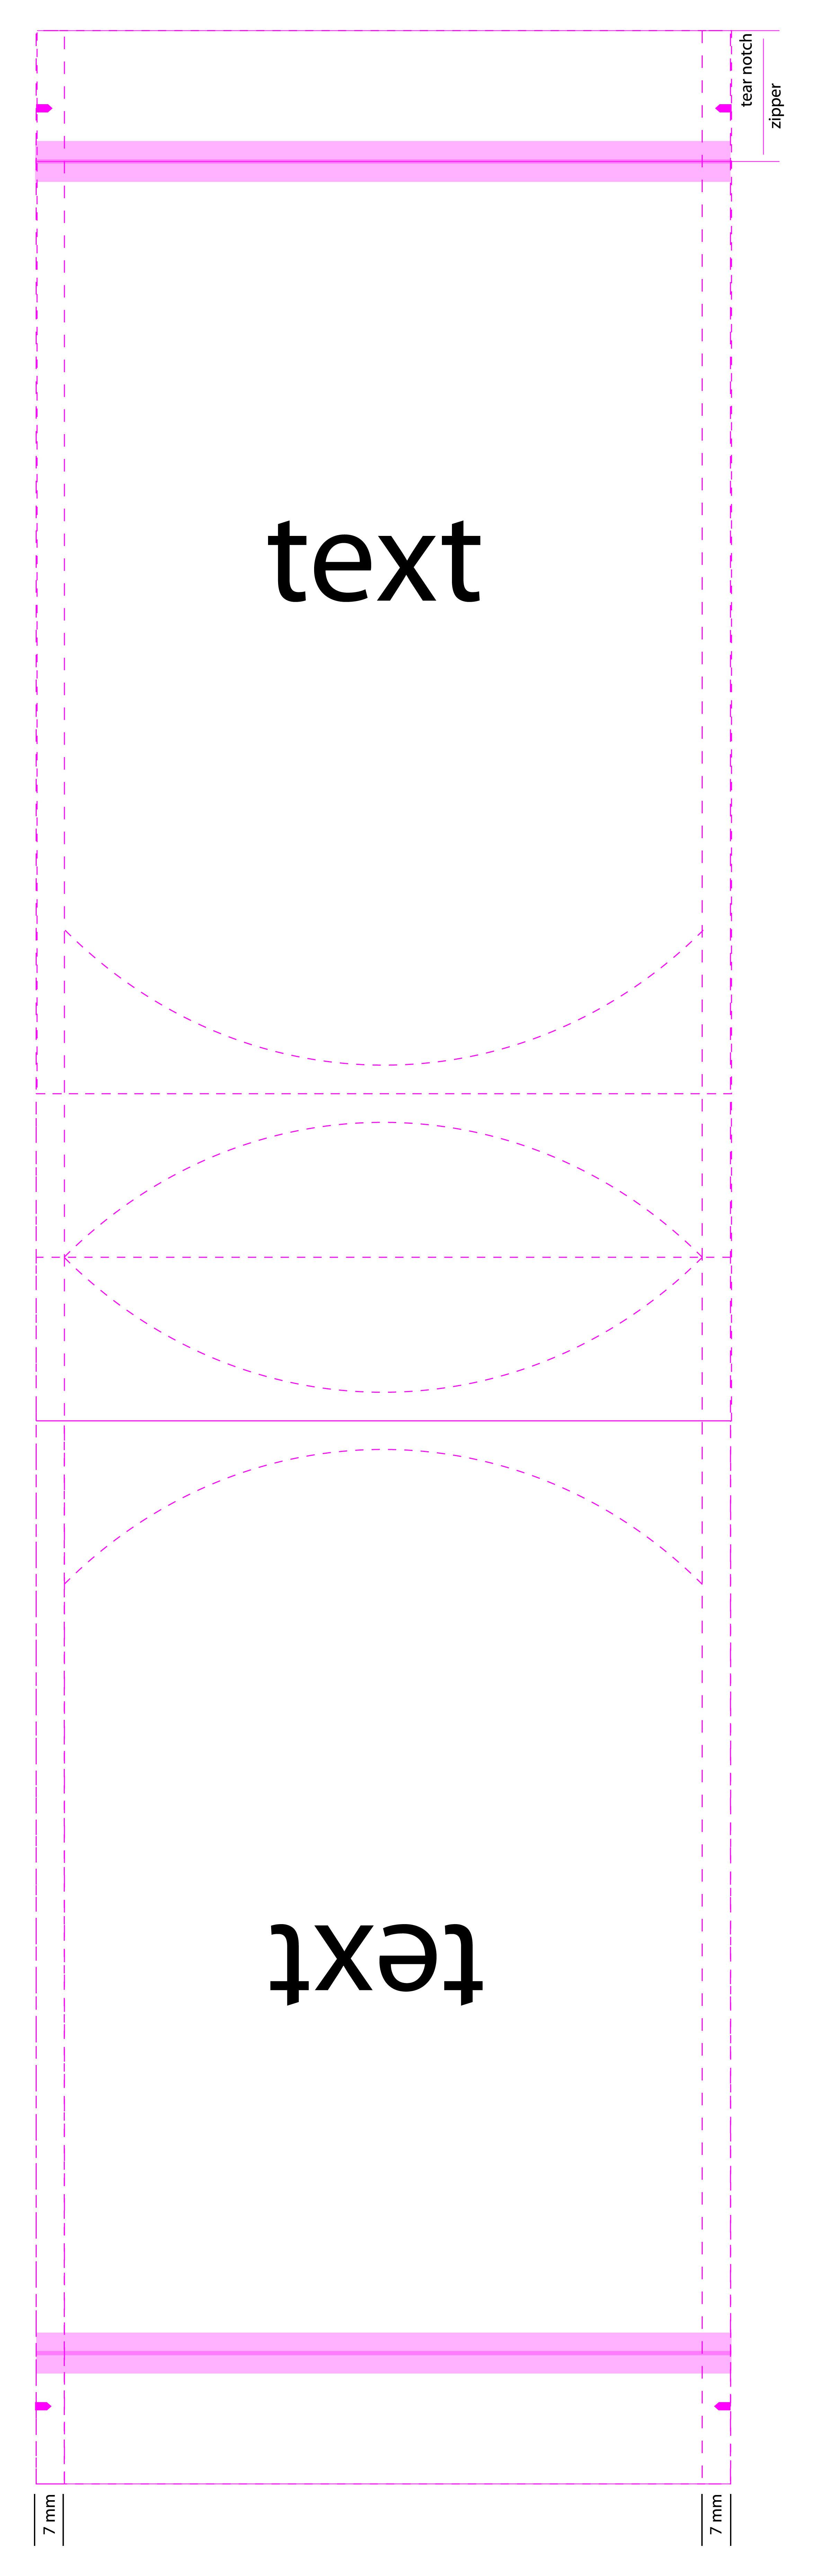 round_bottom_gusset_template.jpg